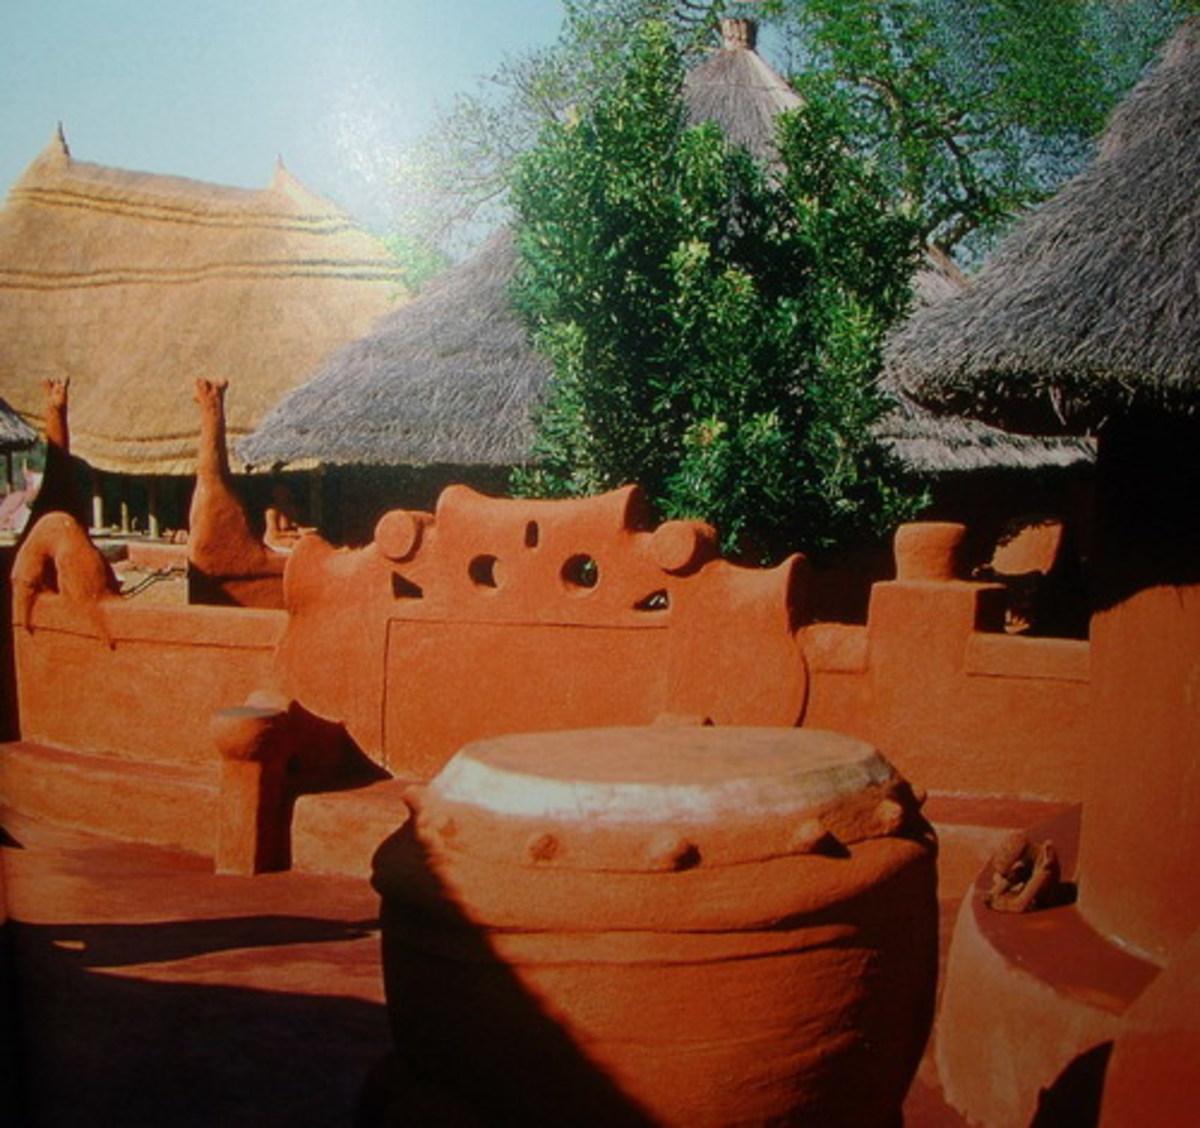 Venda Drum and housing art, architecture and statue